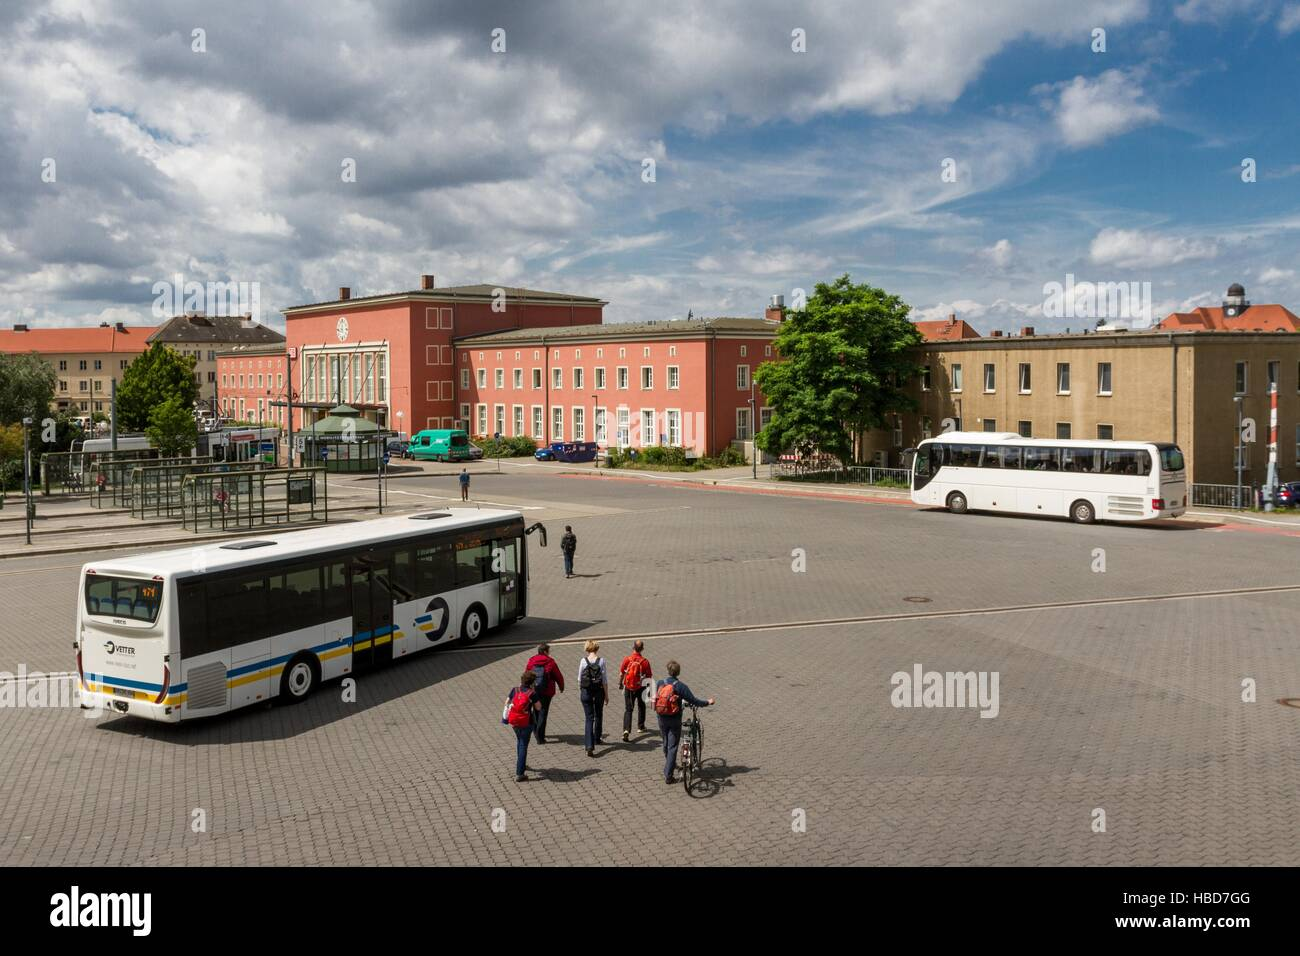 Bus-Treffen in Dessau Hauptbahnhof Stockfoto